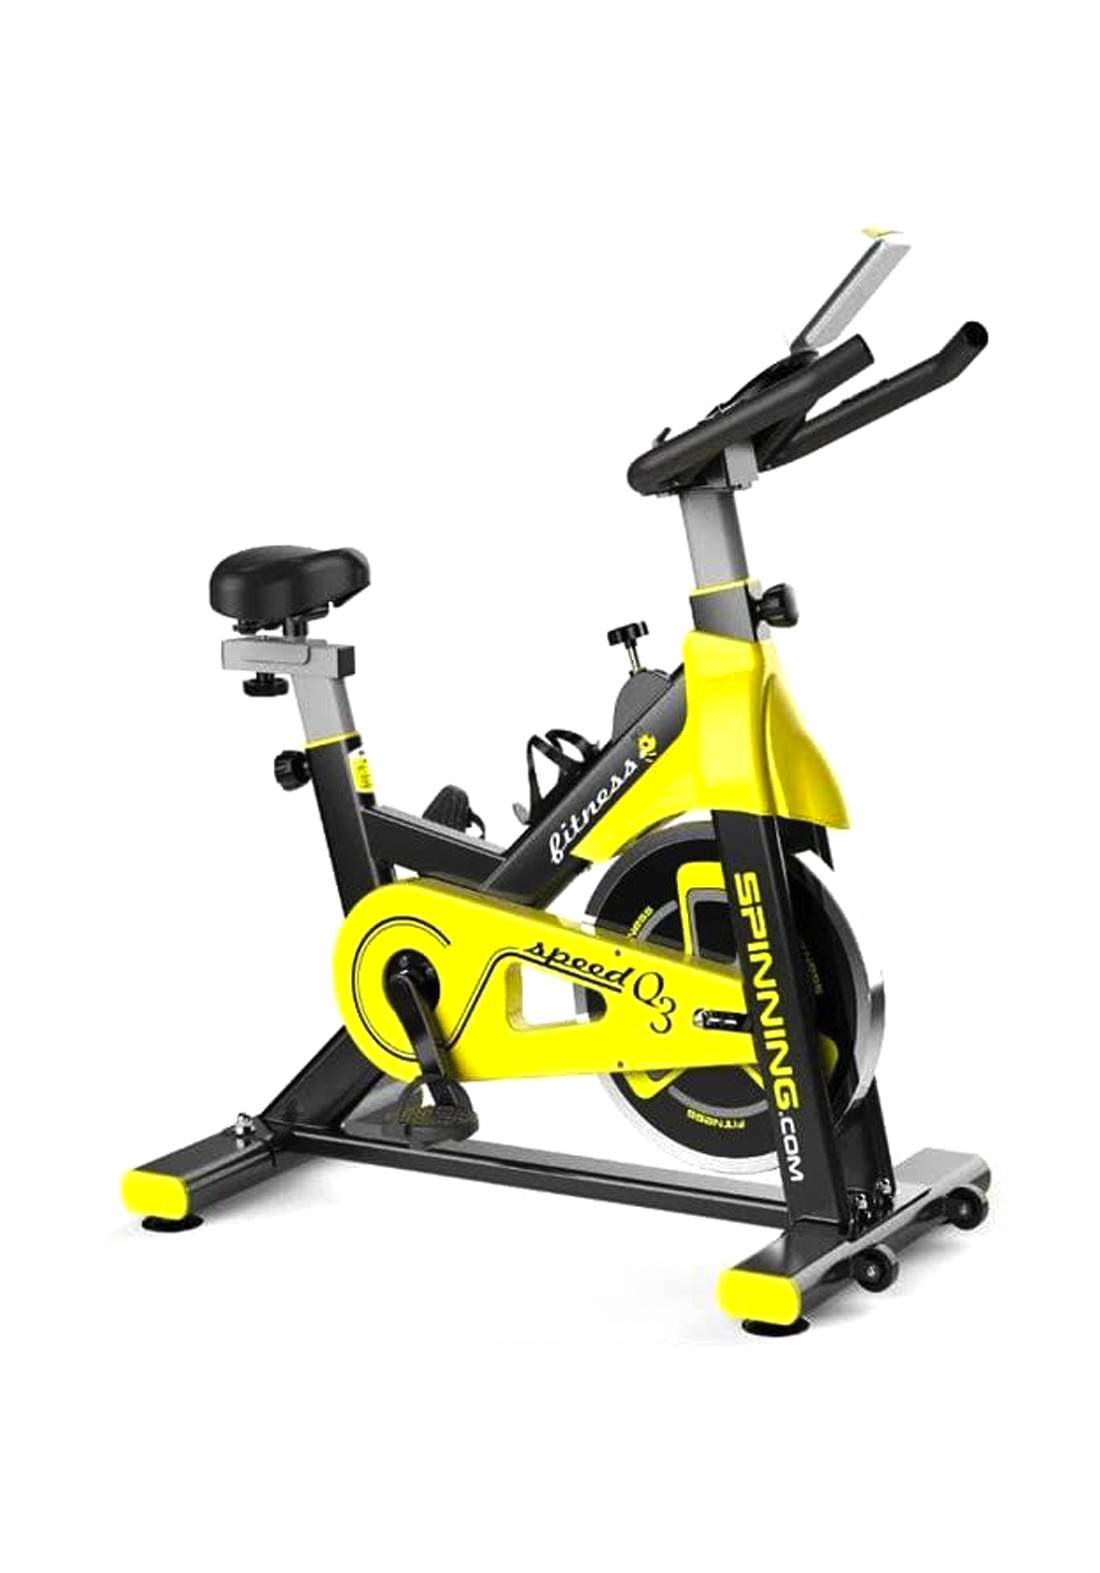 Fixed Sports Bike  بايسكل رياضي ثابت